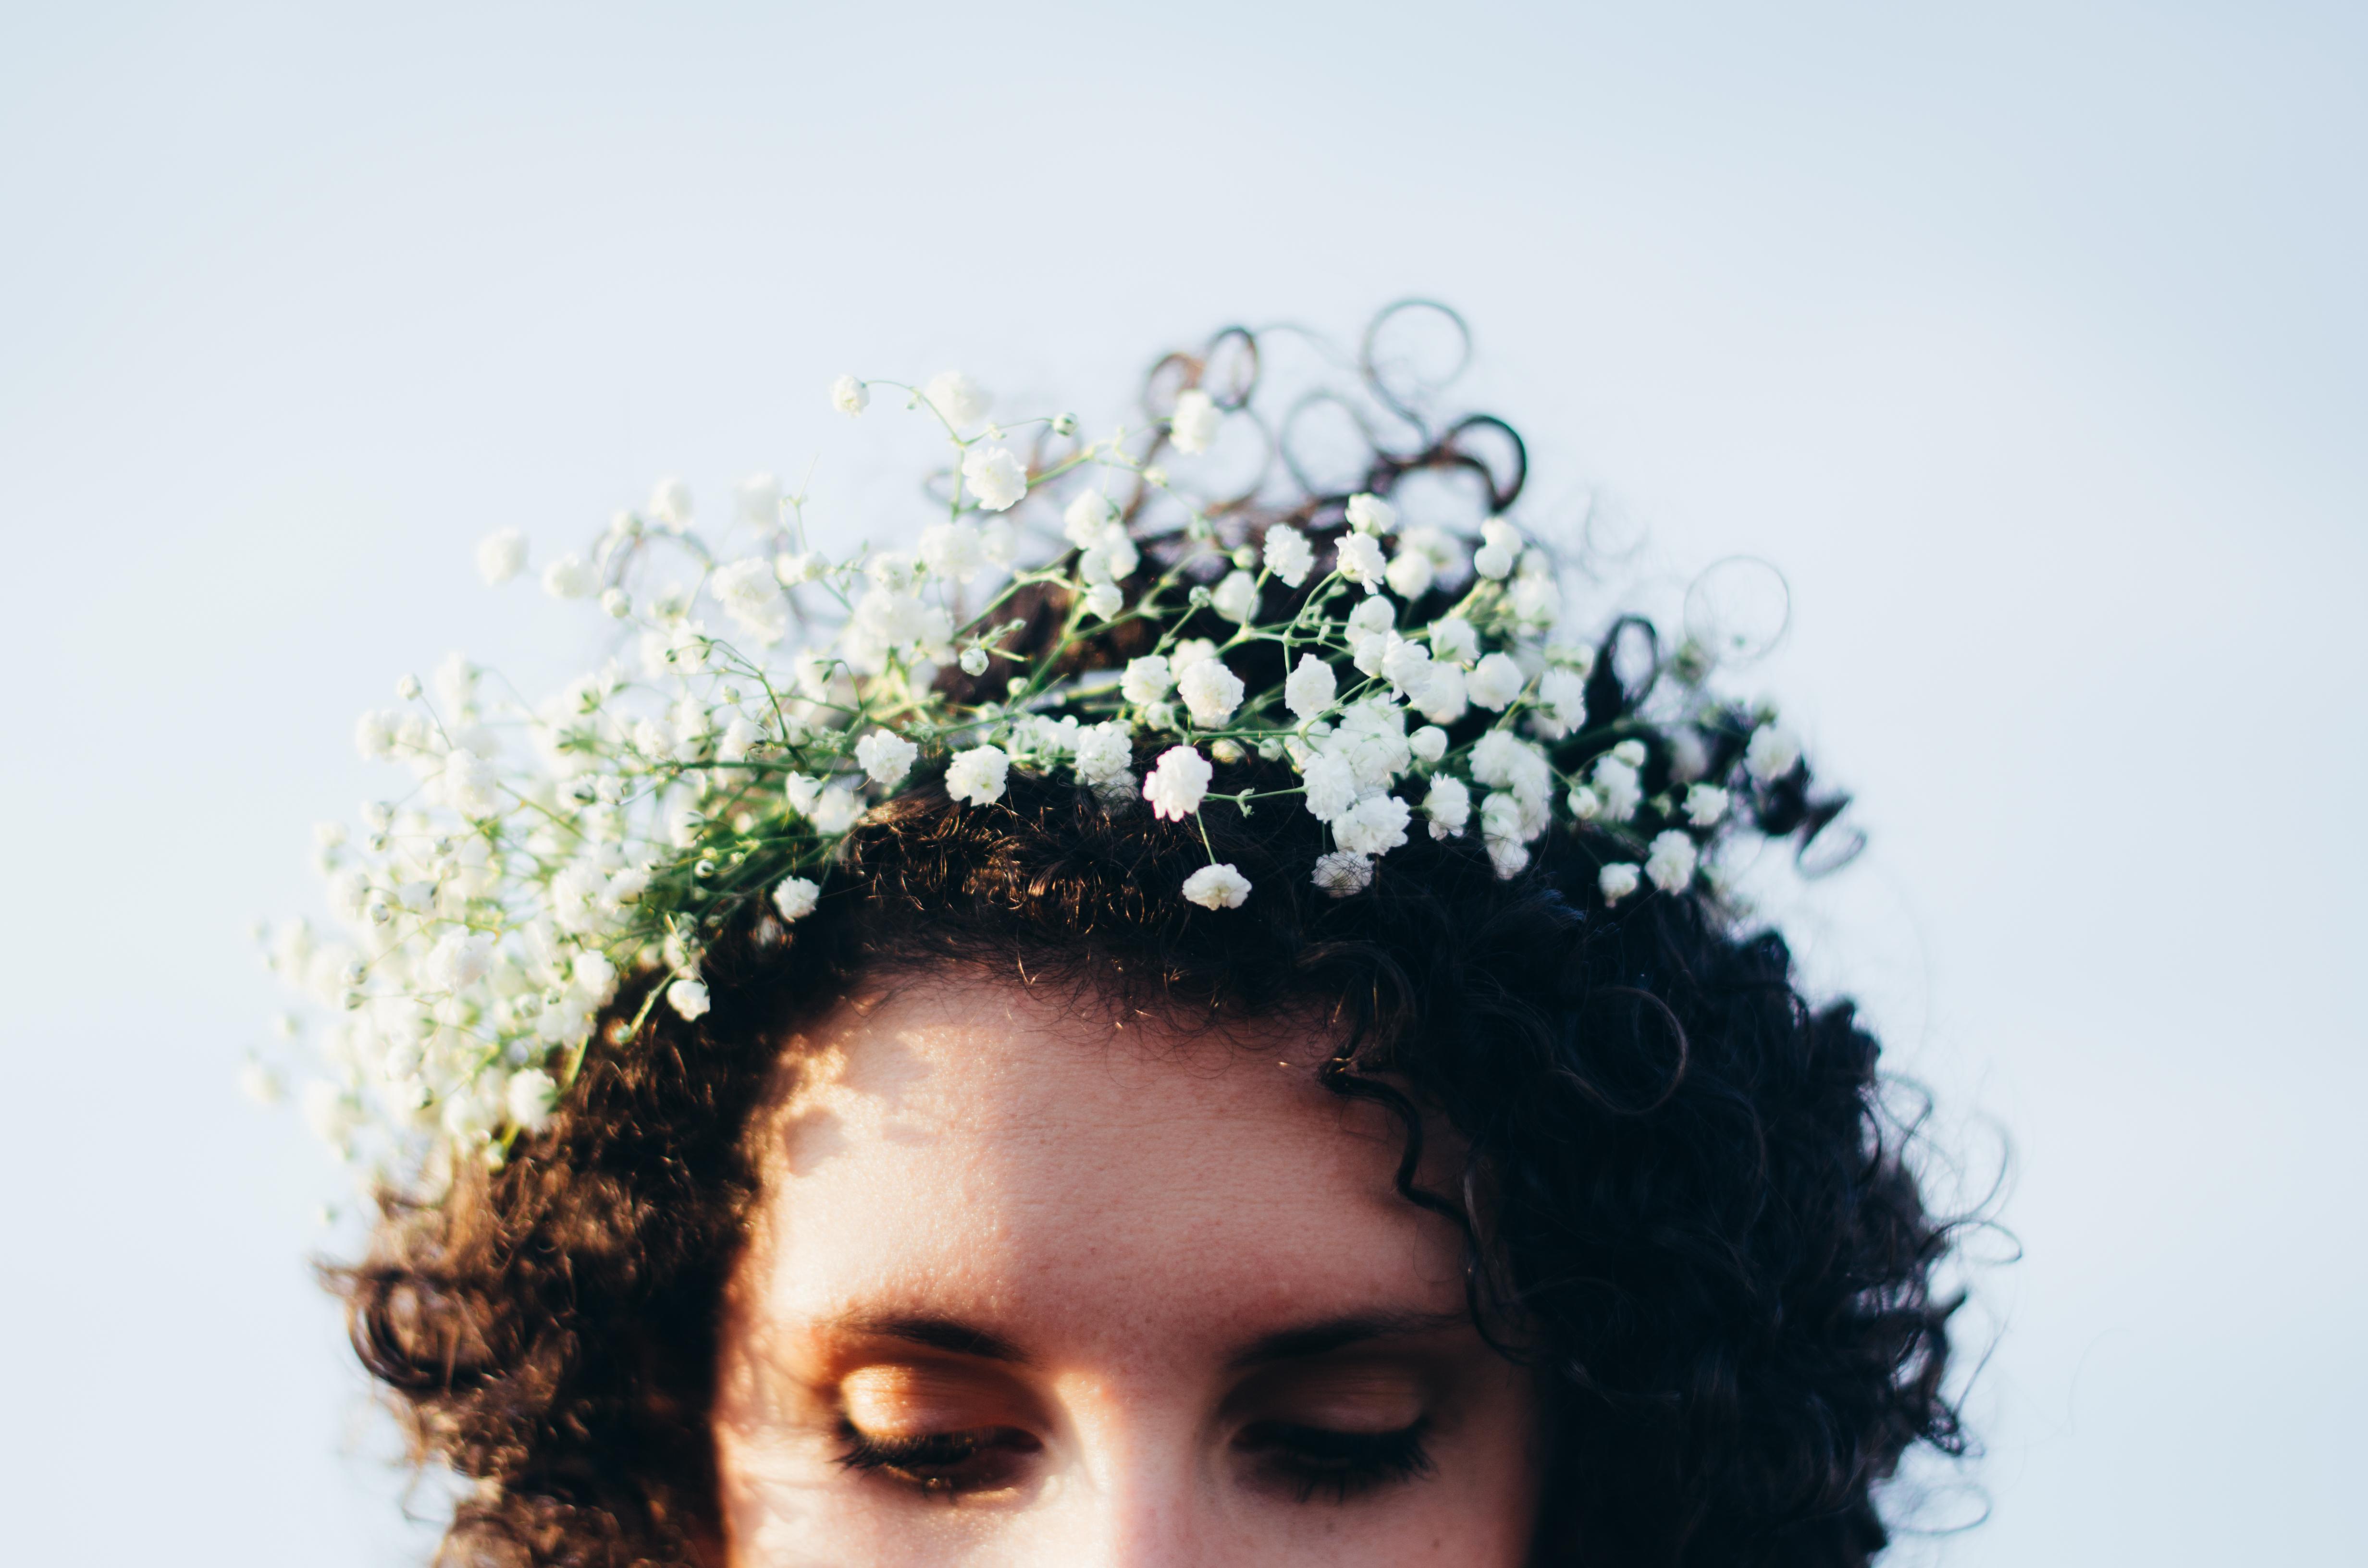 Babies Breath Flower Crown on juliettelaura.blogspot.com